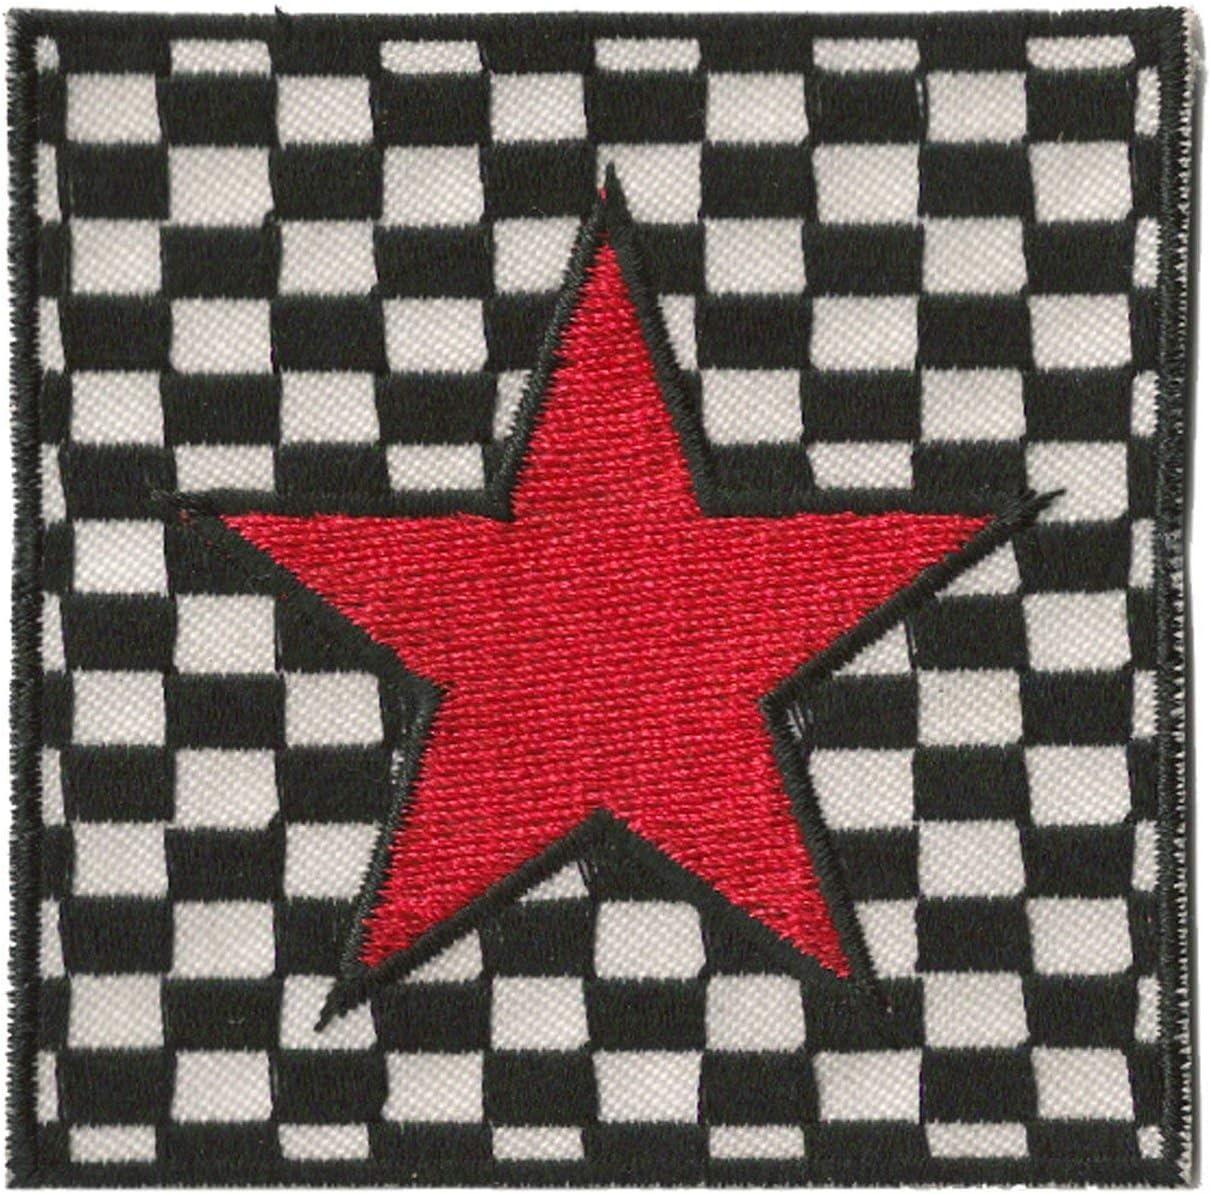 Nagapatches Parche Parche para Planchar Rojo Star Ska